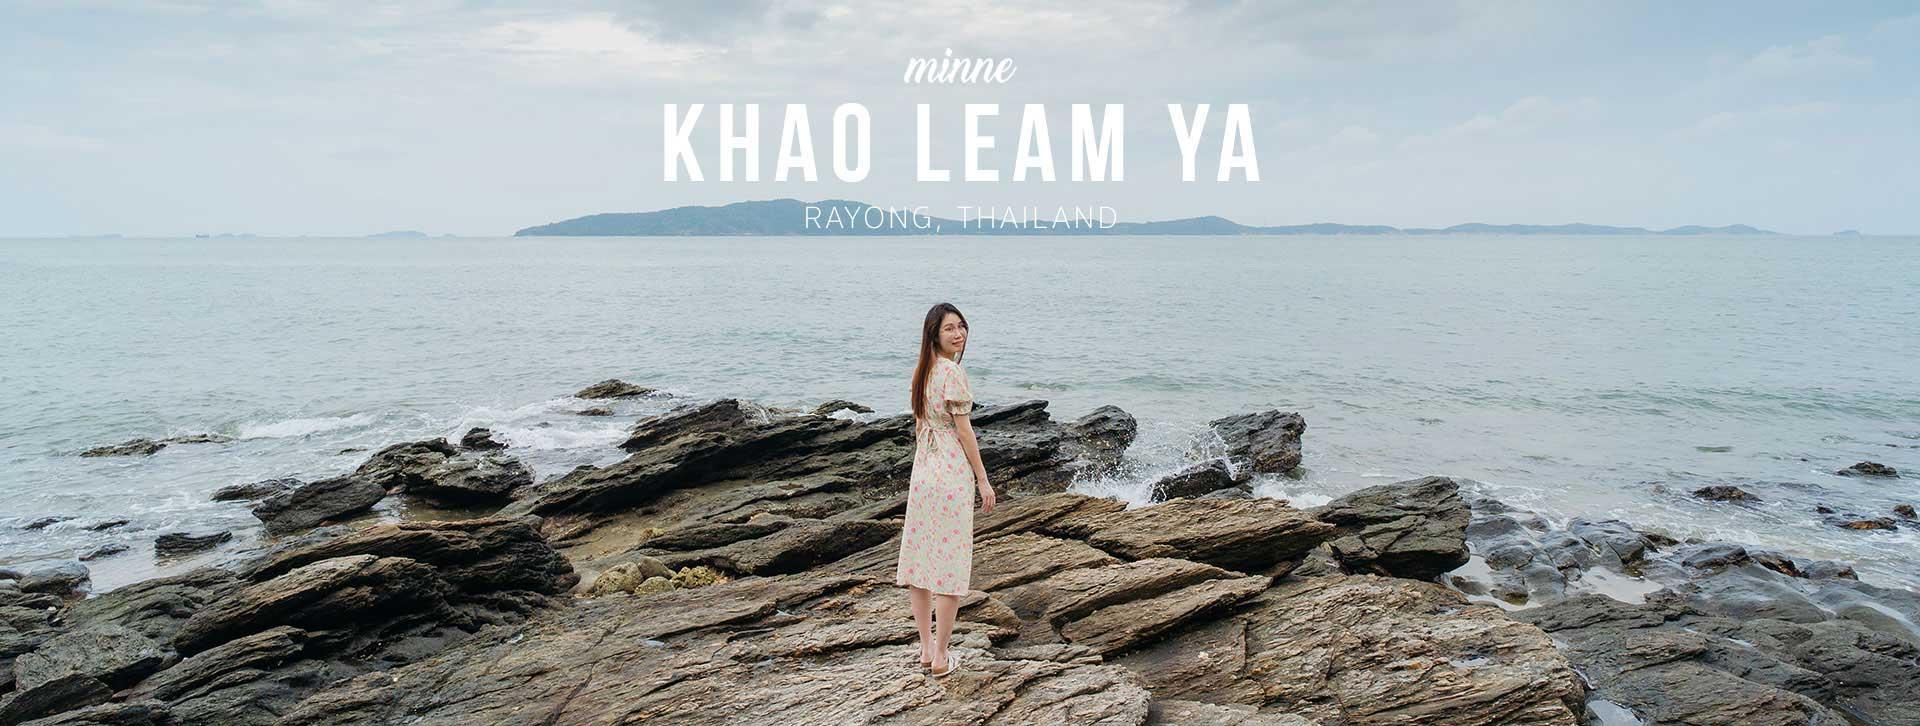 m khao lam ya long cover